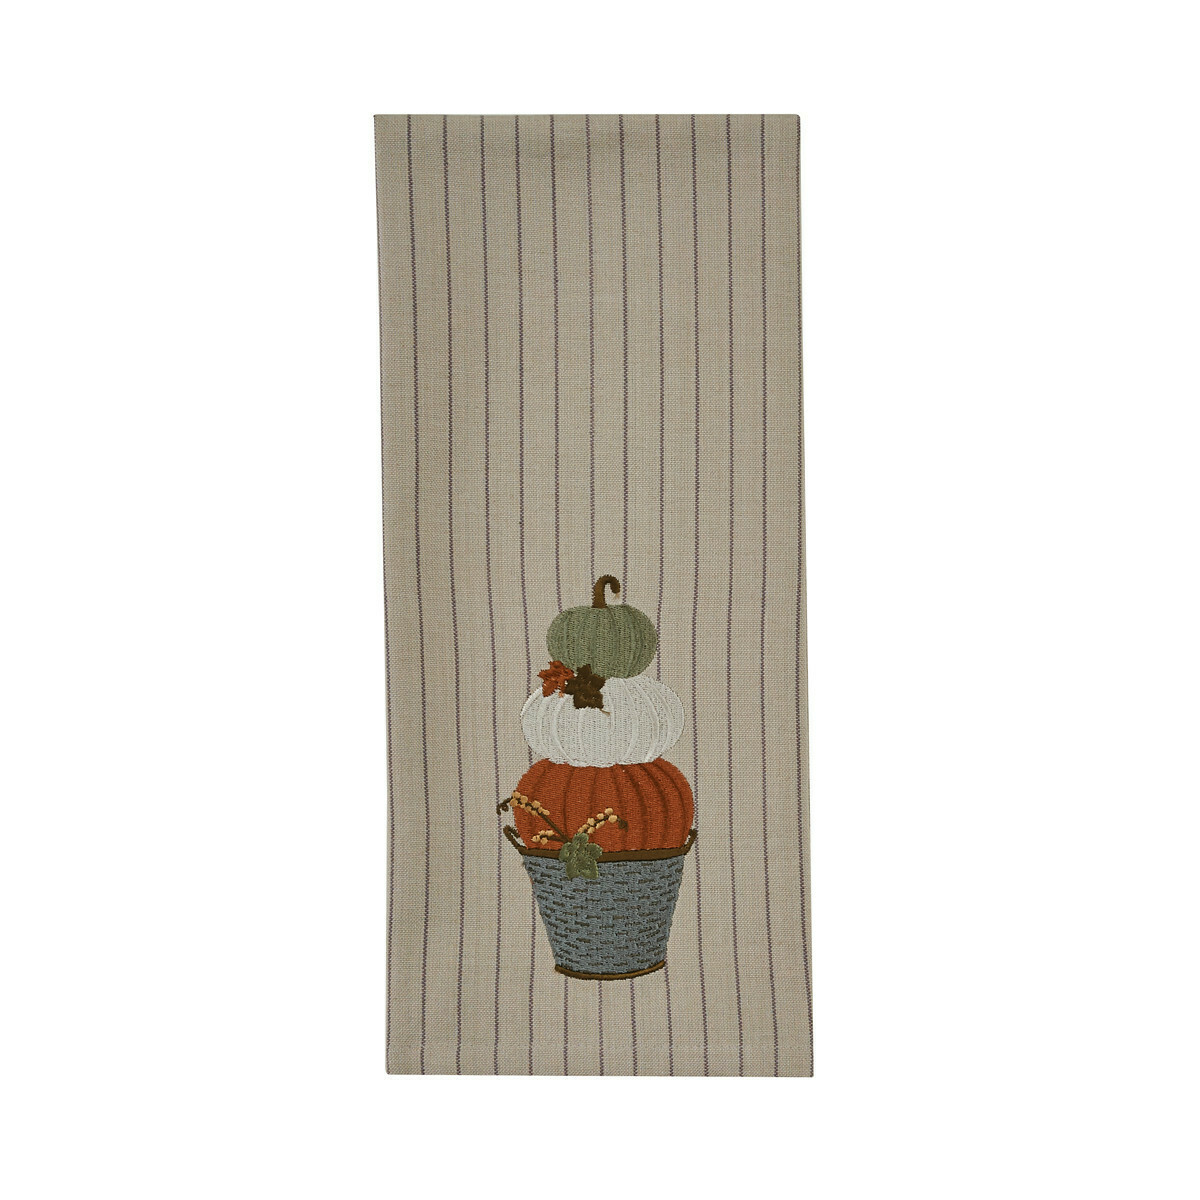 Stacked Pumpkins Embroidered Dishtowel